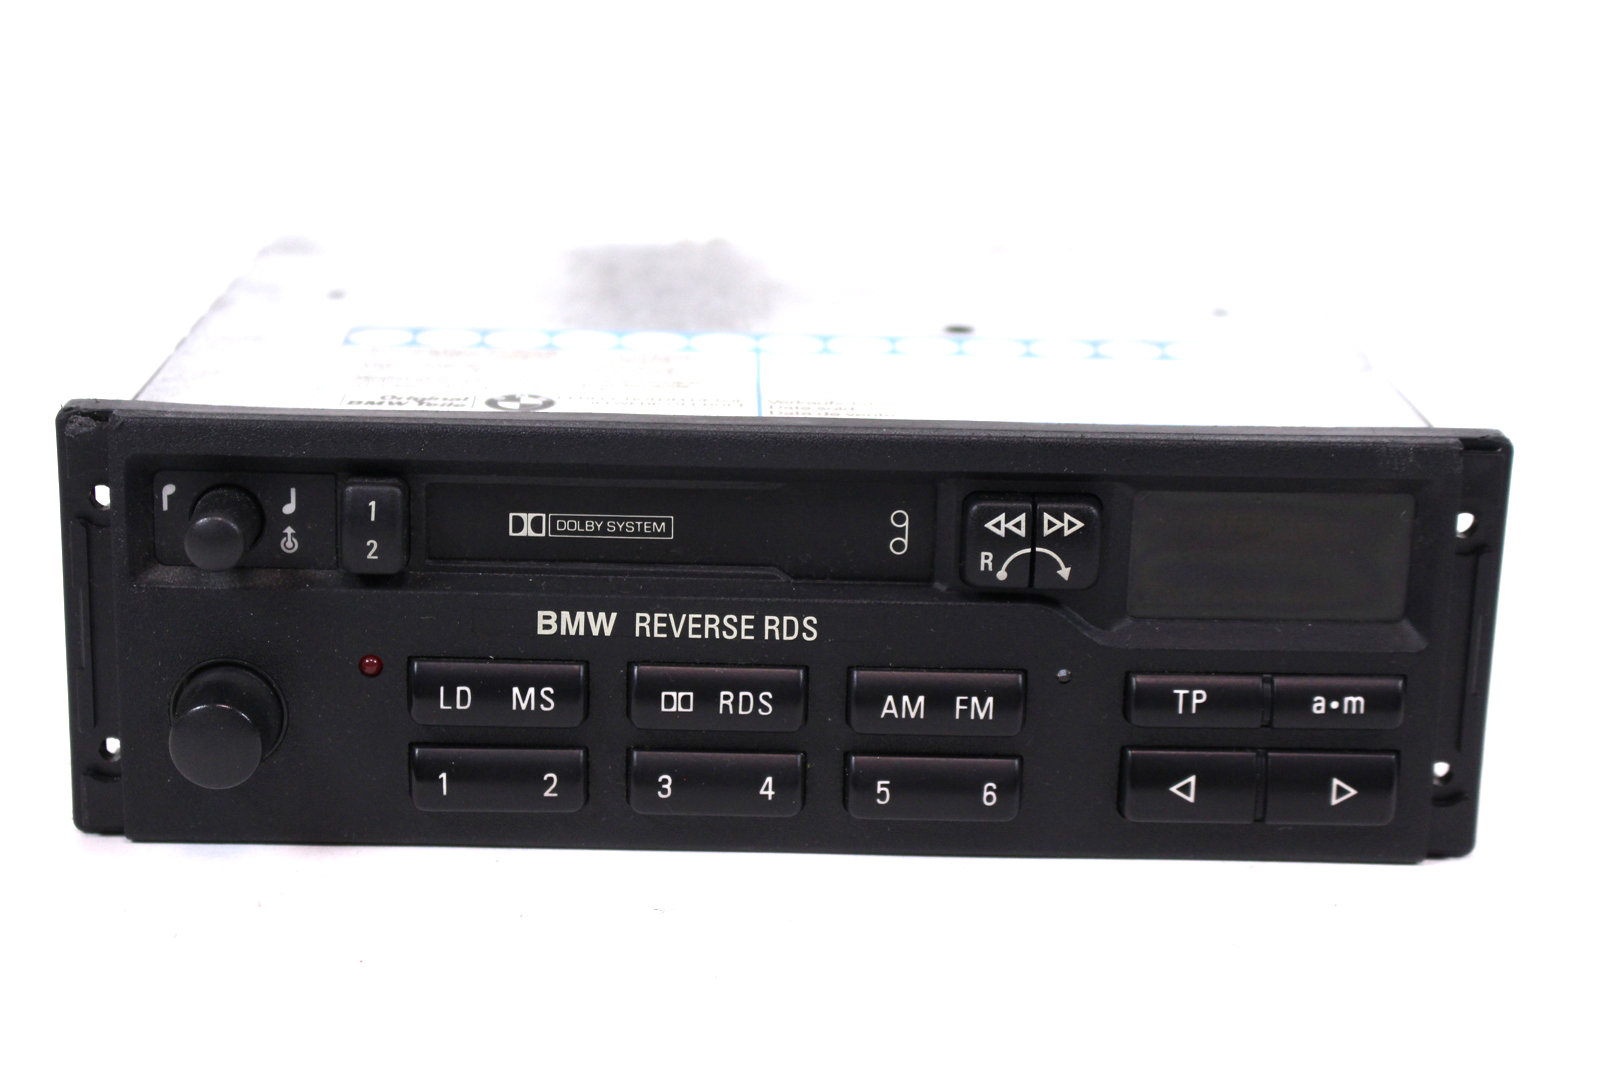 autoradio blaupunkt mc kassette bmw reverse rds 7643836340 mit code tape defekt ebay. Black Bedroom Furniture Sets. Home Design Ideas